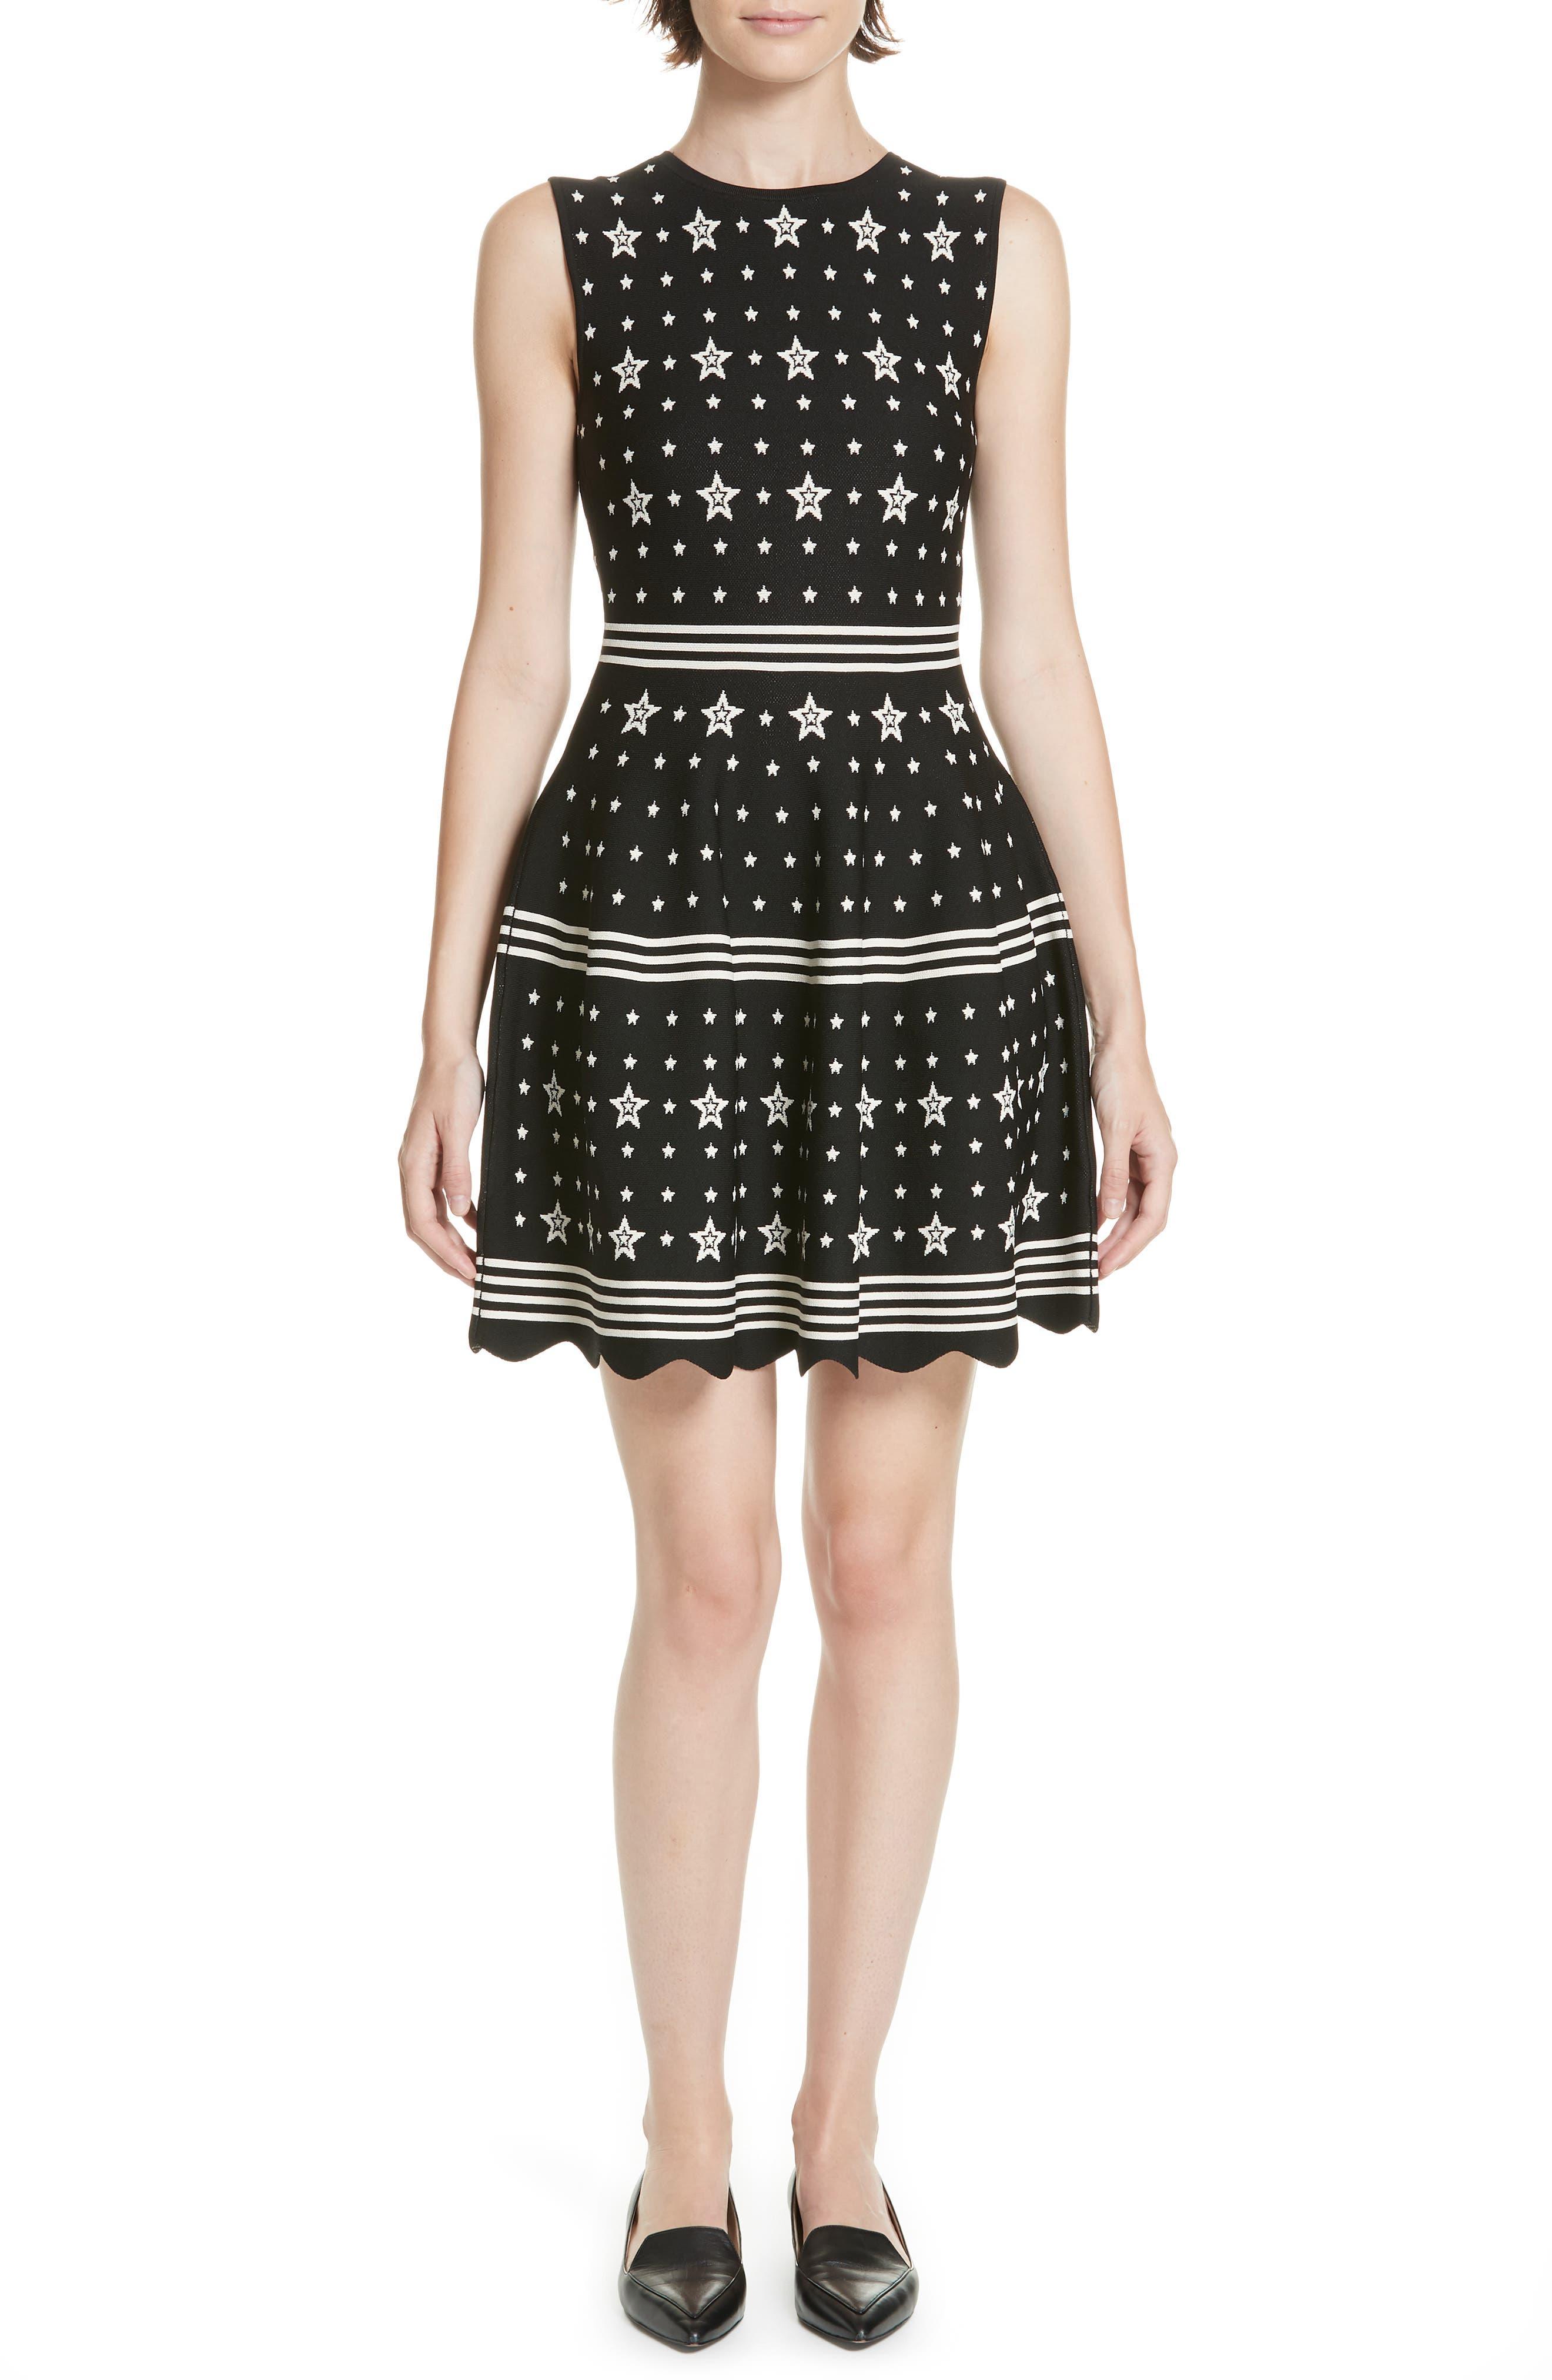 Mariae Star Dress,                             Main thumbnail 1, color,                             001